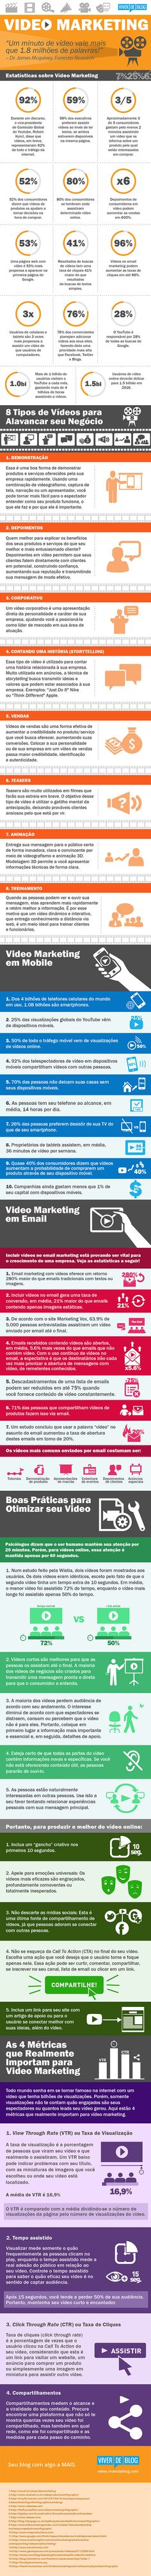 Video Marketing Tips For Every Business Owner Inbound Marketing, Marketing Online, Business Marketing, Content Marketing, Internet Marketing, Social Media Marketing, Digital Marketing, Web Design, Le Web